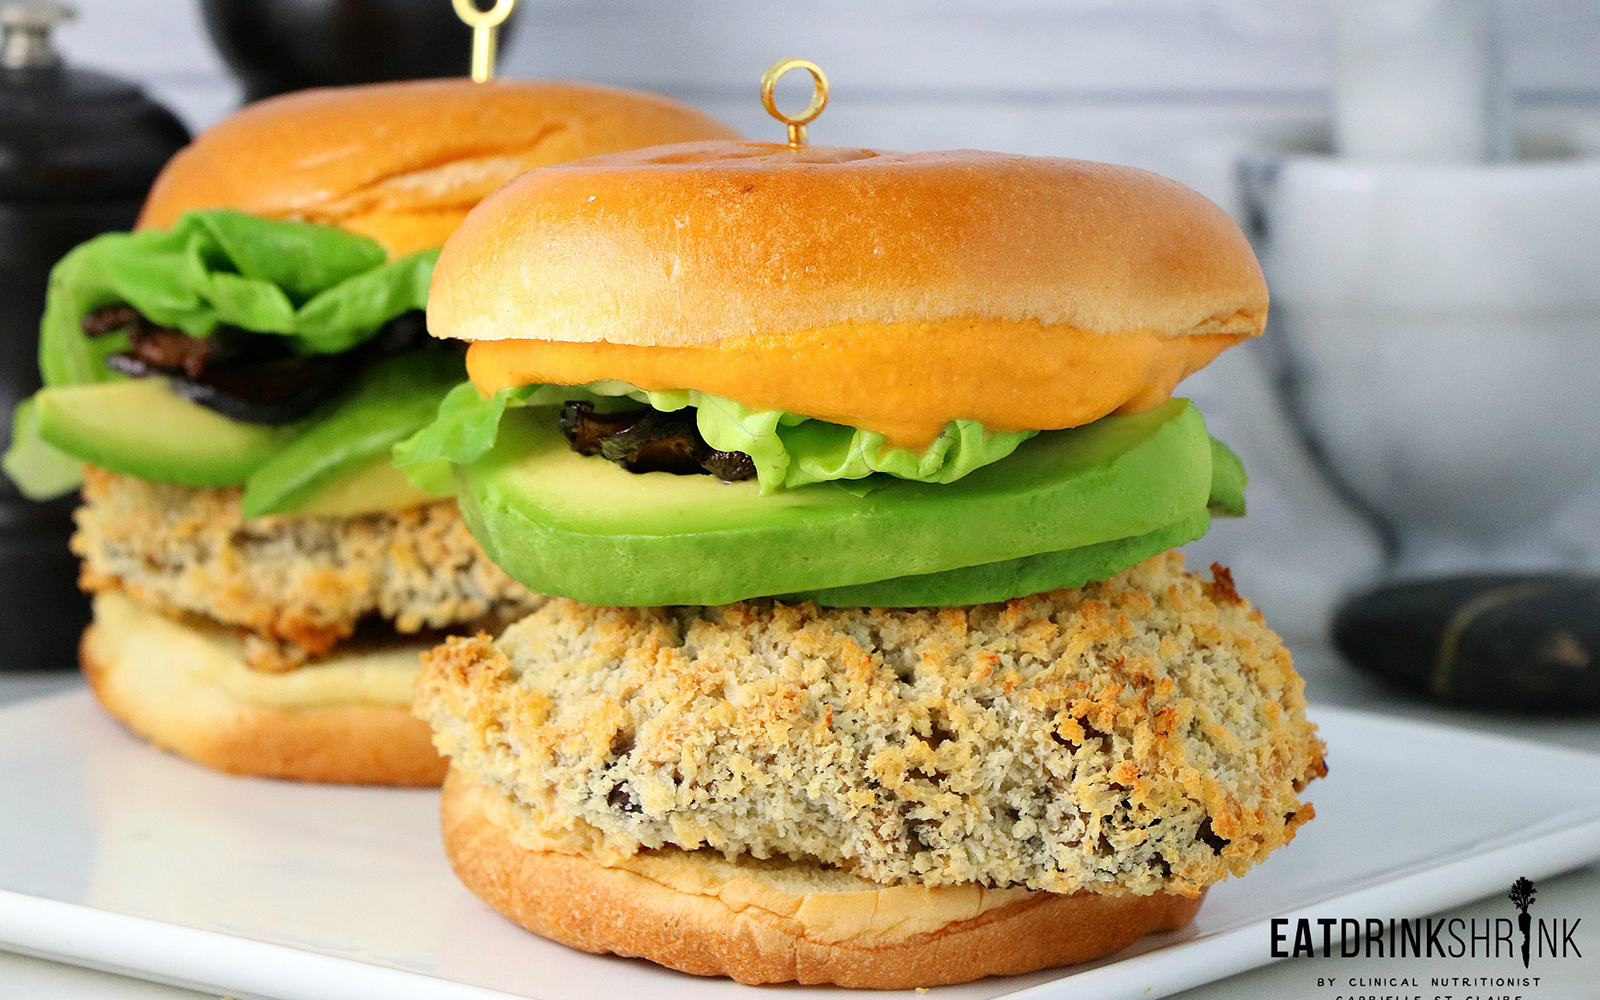 Beer-battered meatless mushroom burger